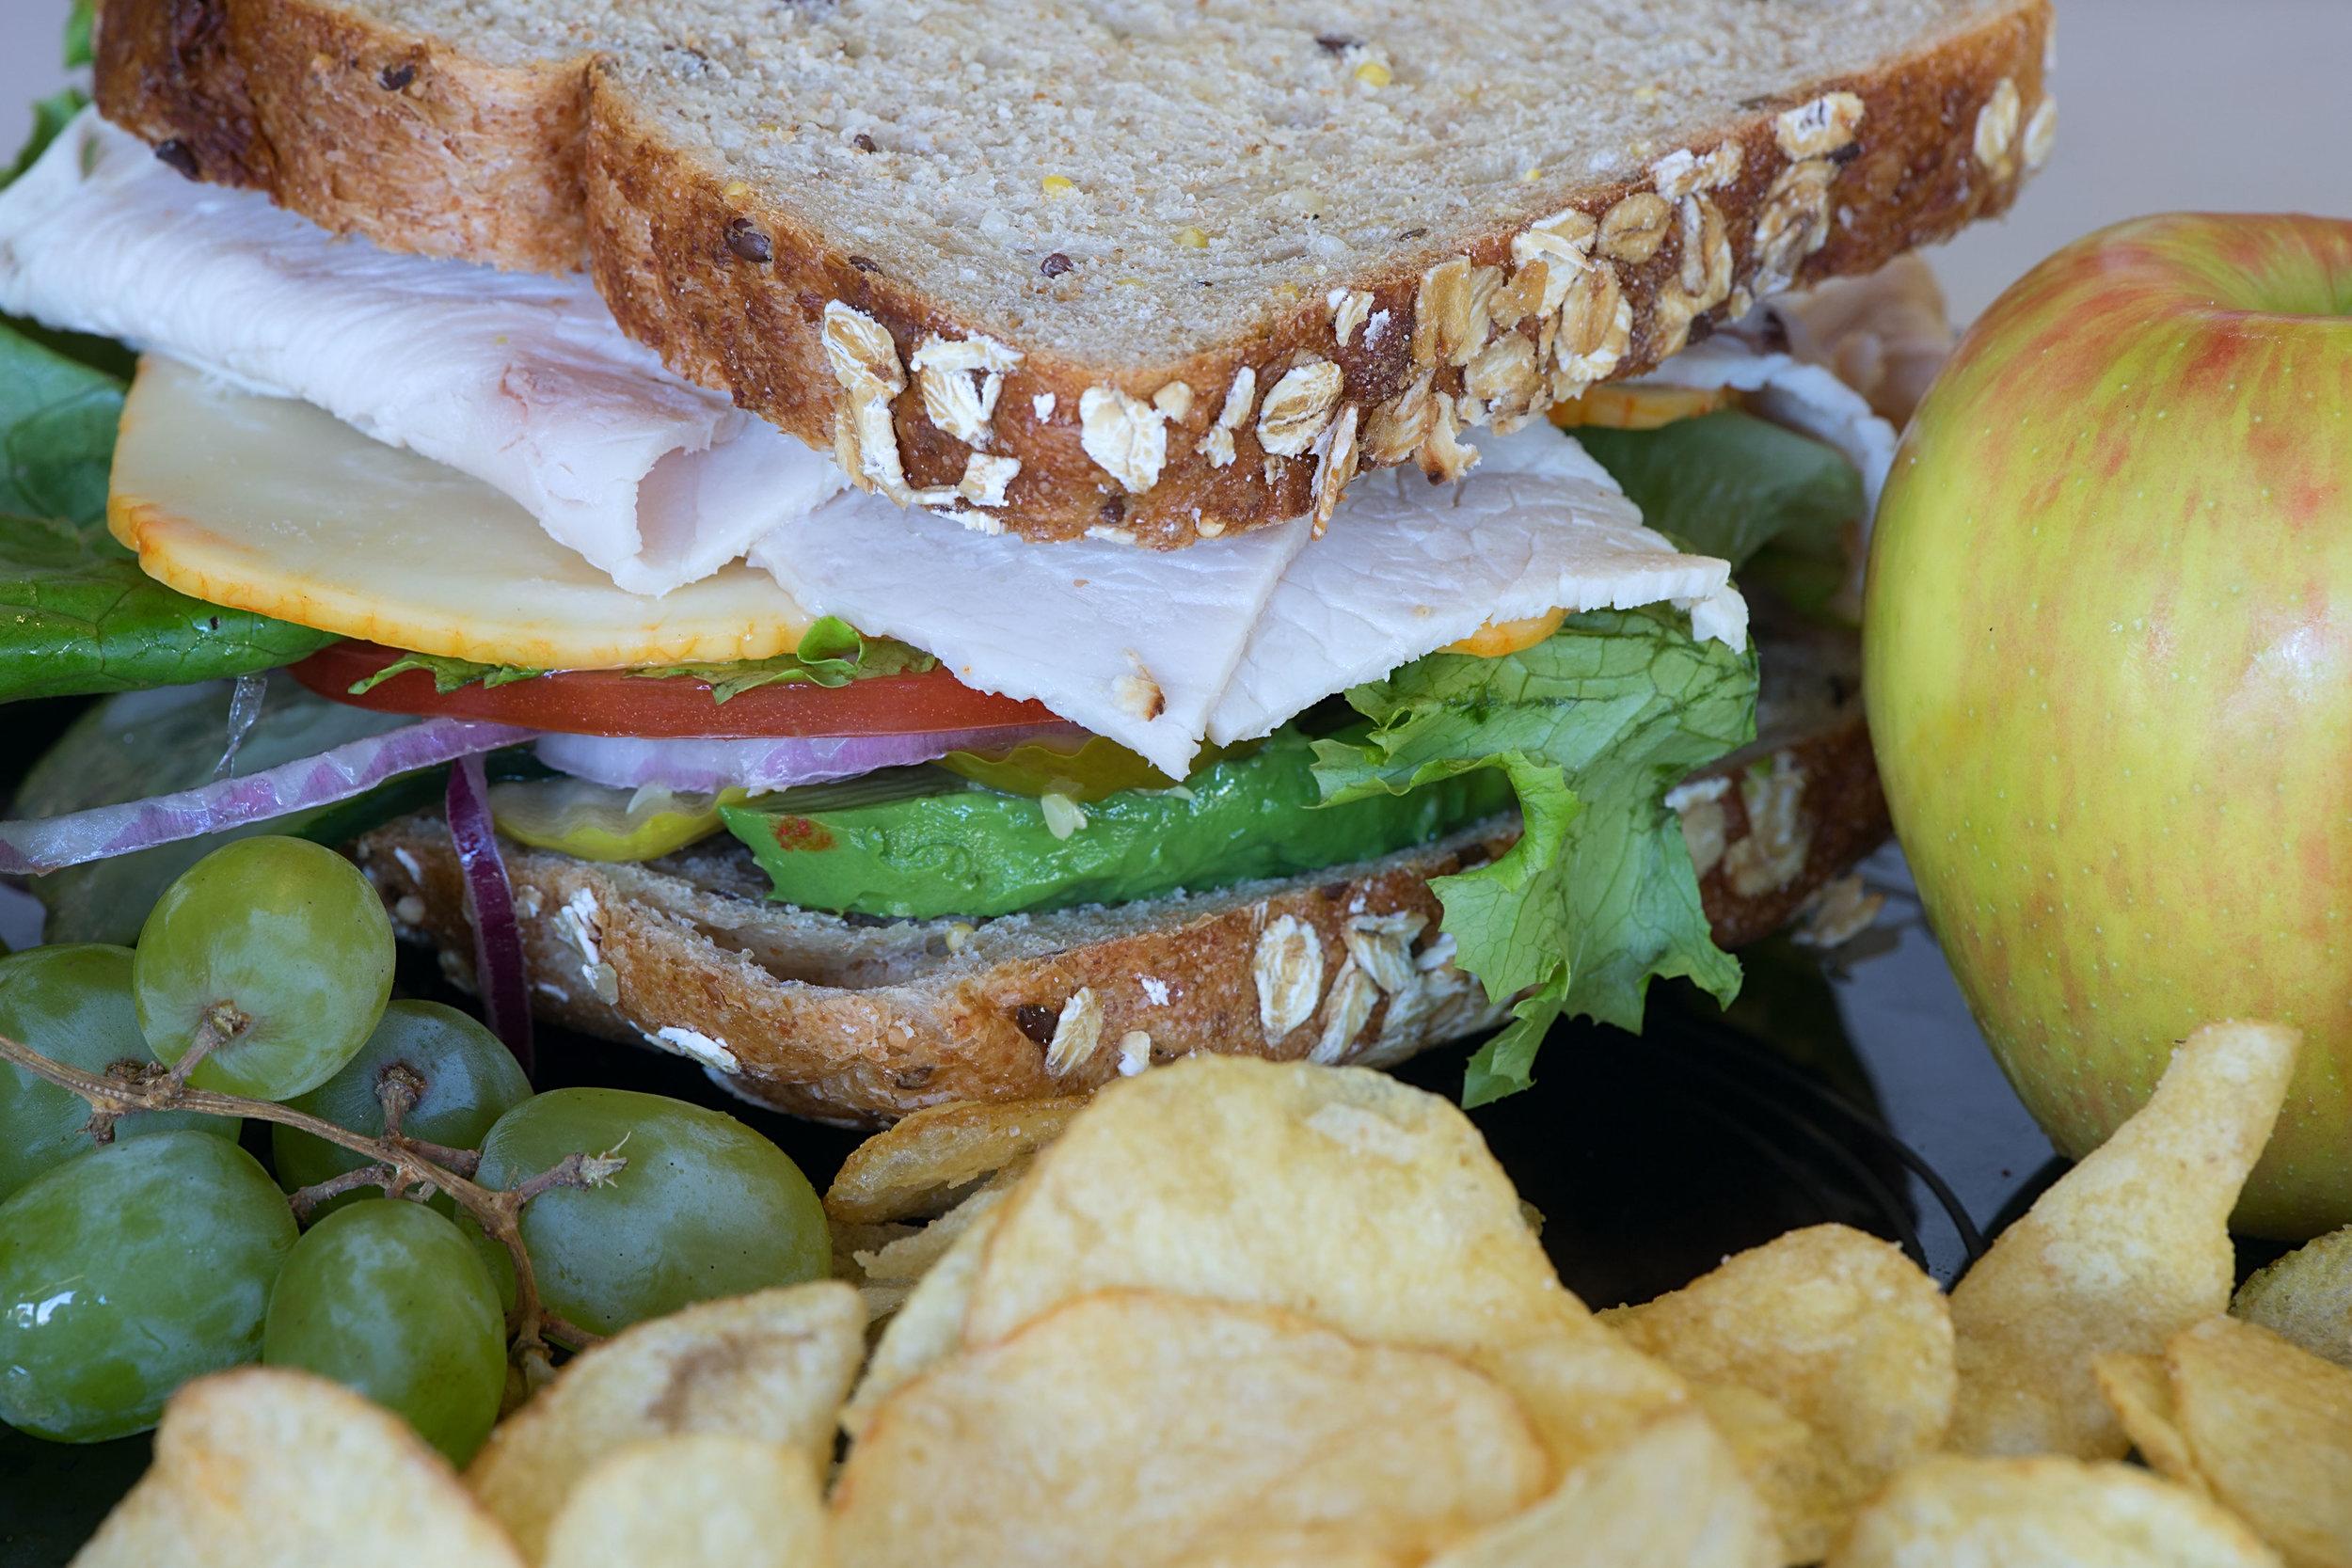 sandwich_turk and muenster on multigrain.jpg